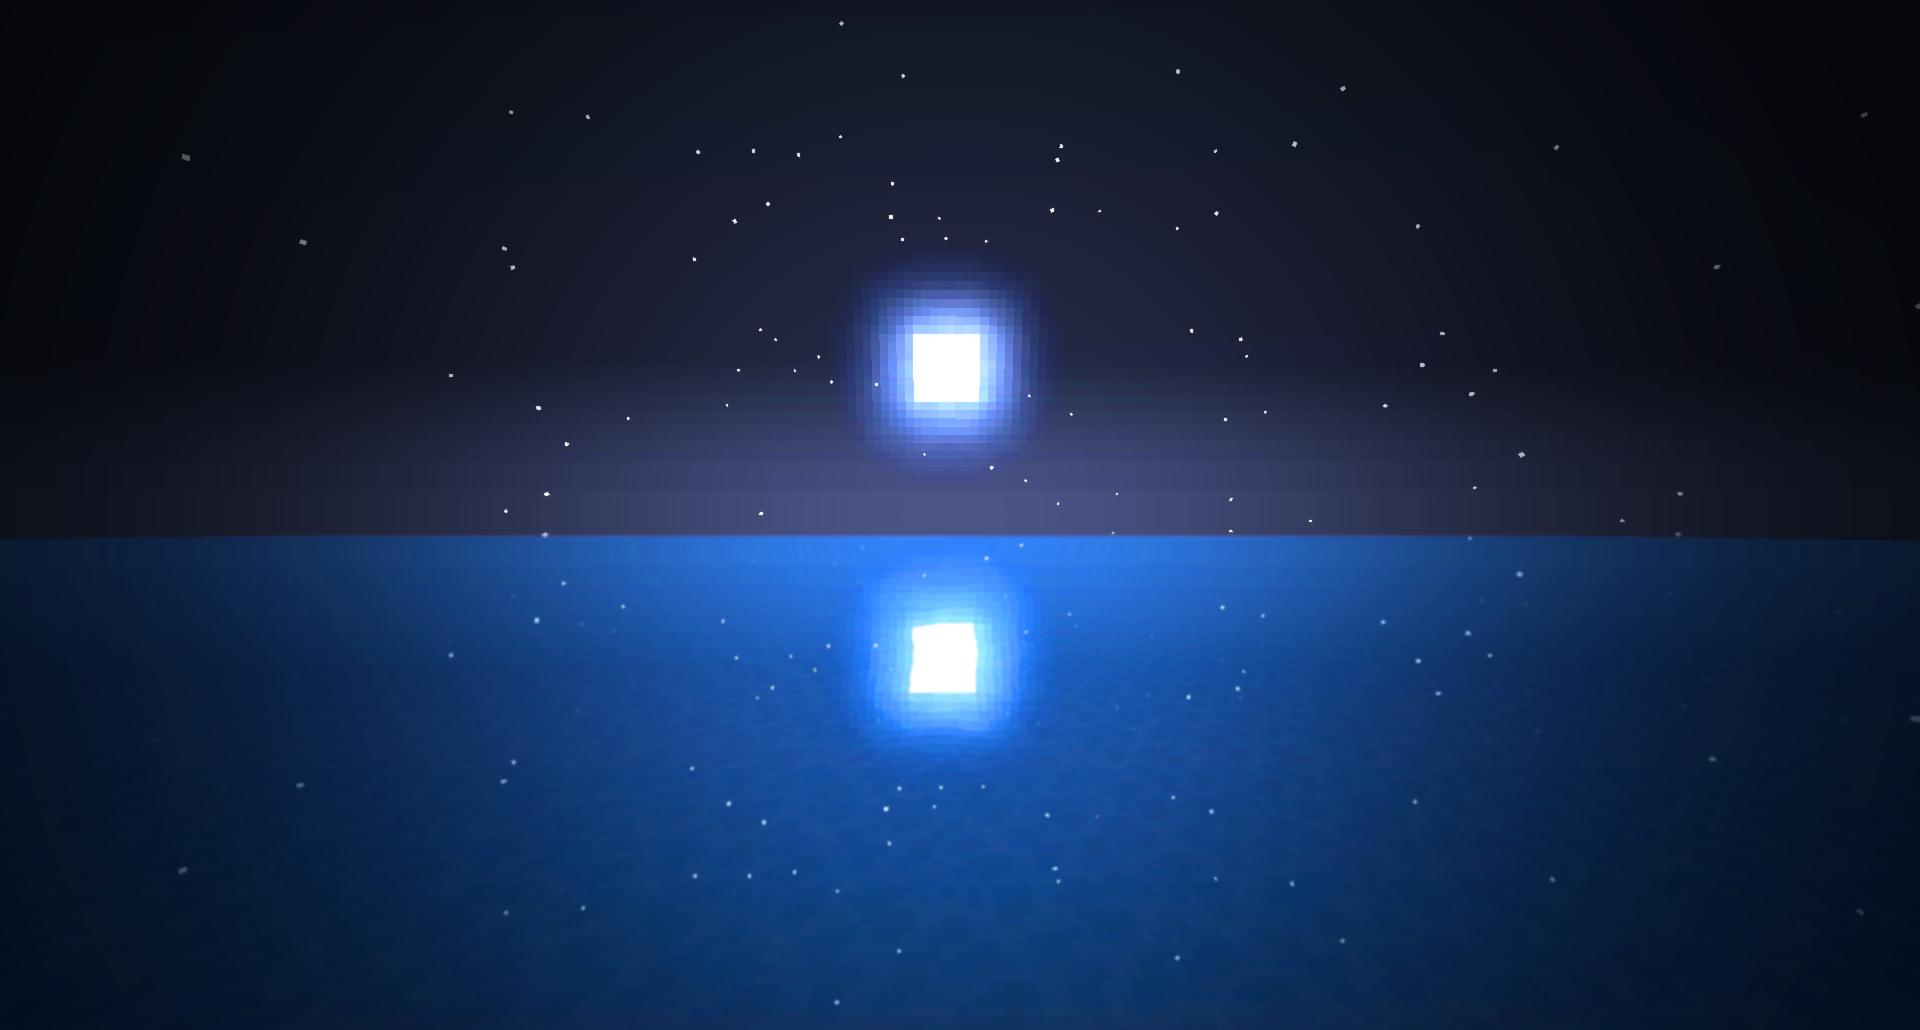 Minecraft Moon Wallpaper by squishypon